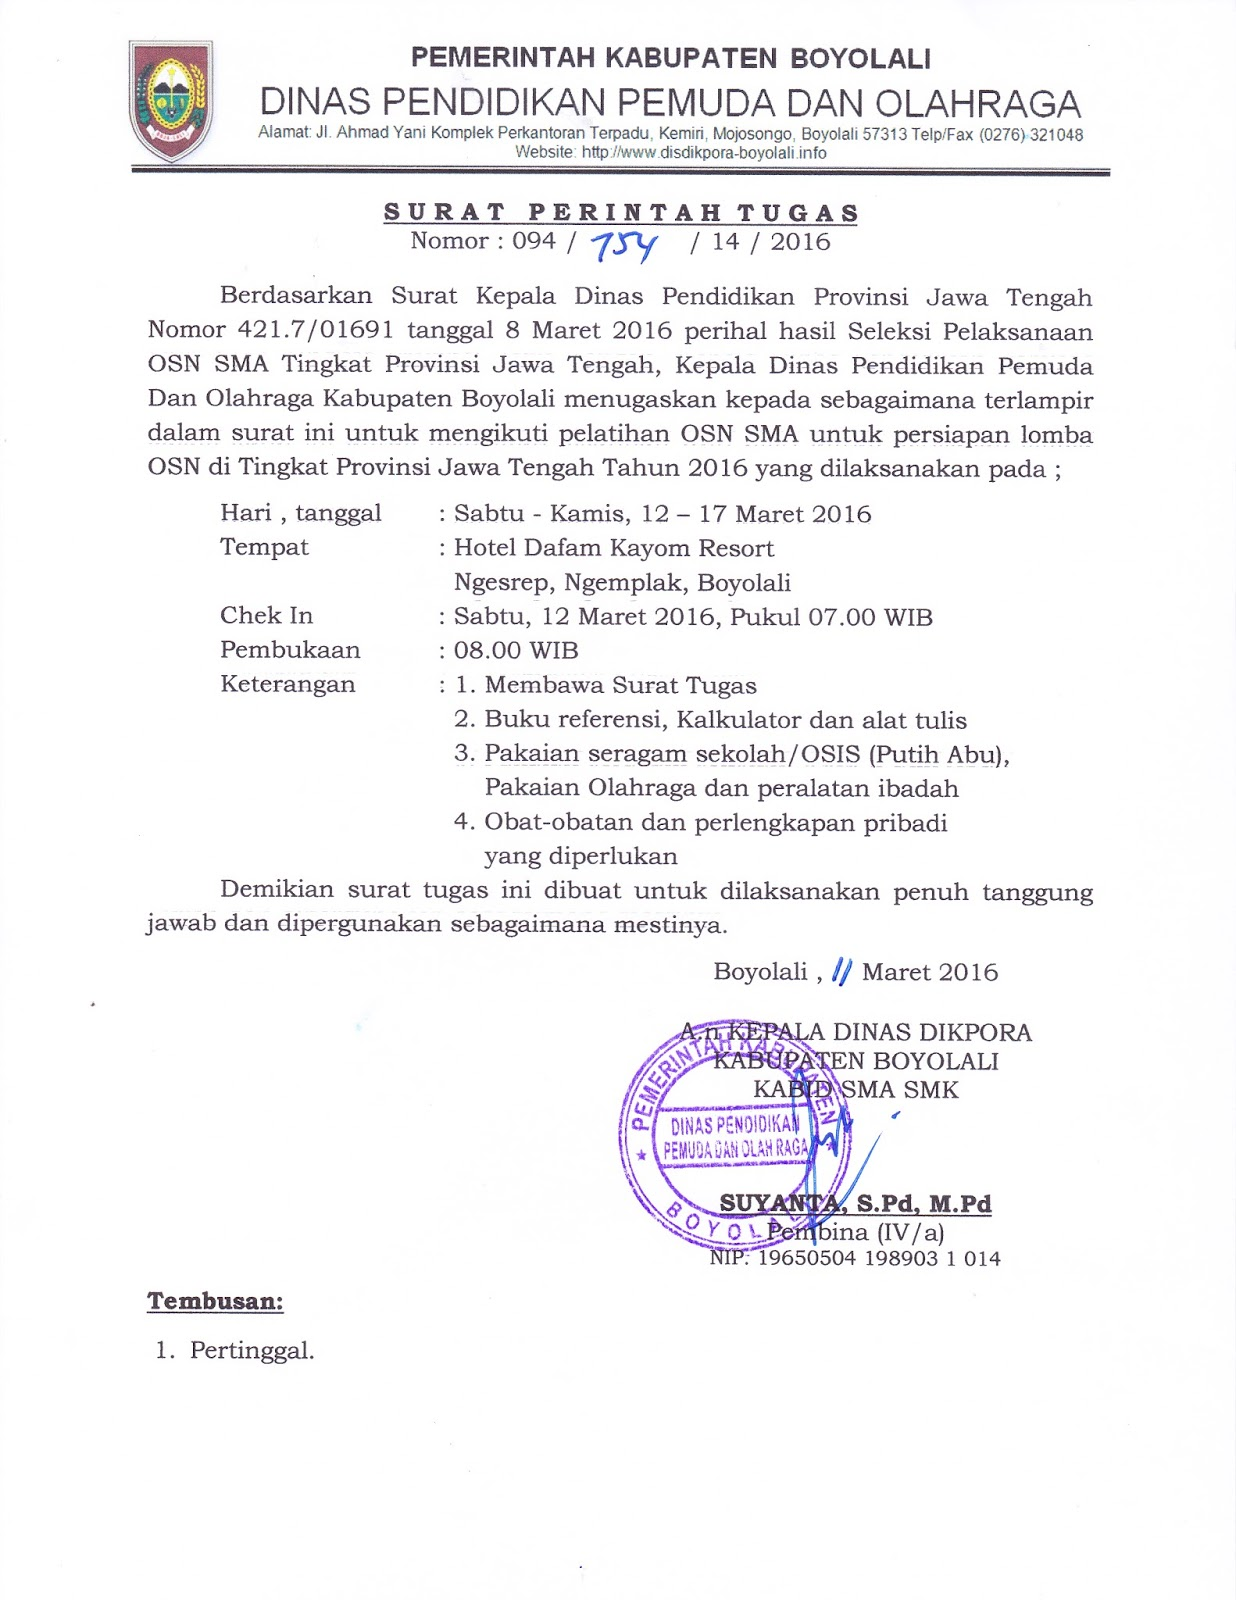 Info Sma Smk Kabupaten Boyolali Surat Perintah Tugas Pelatihan Osn